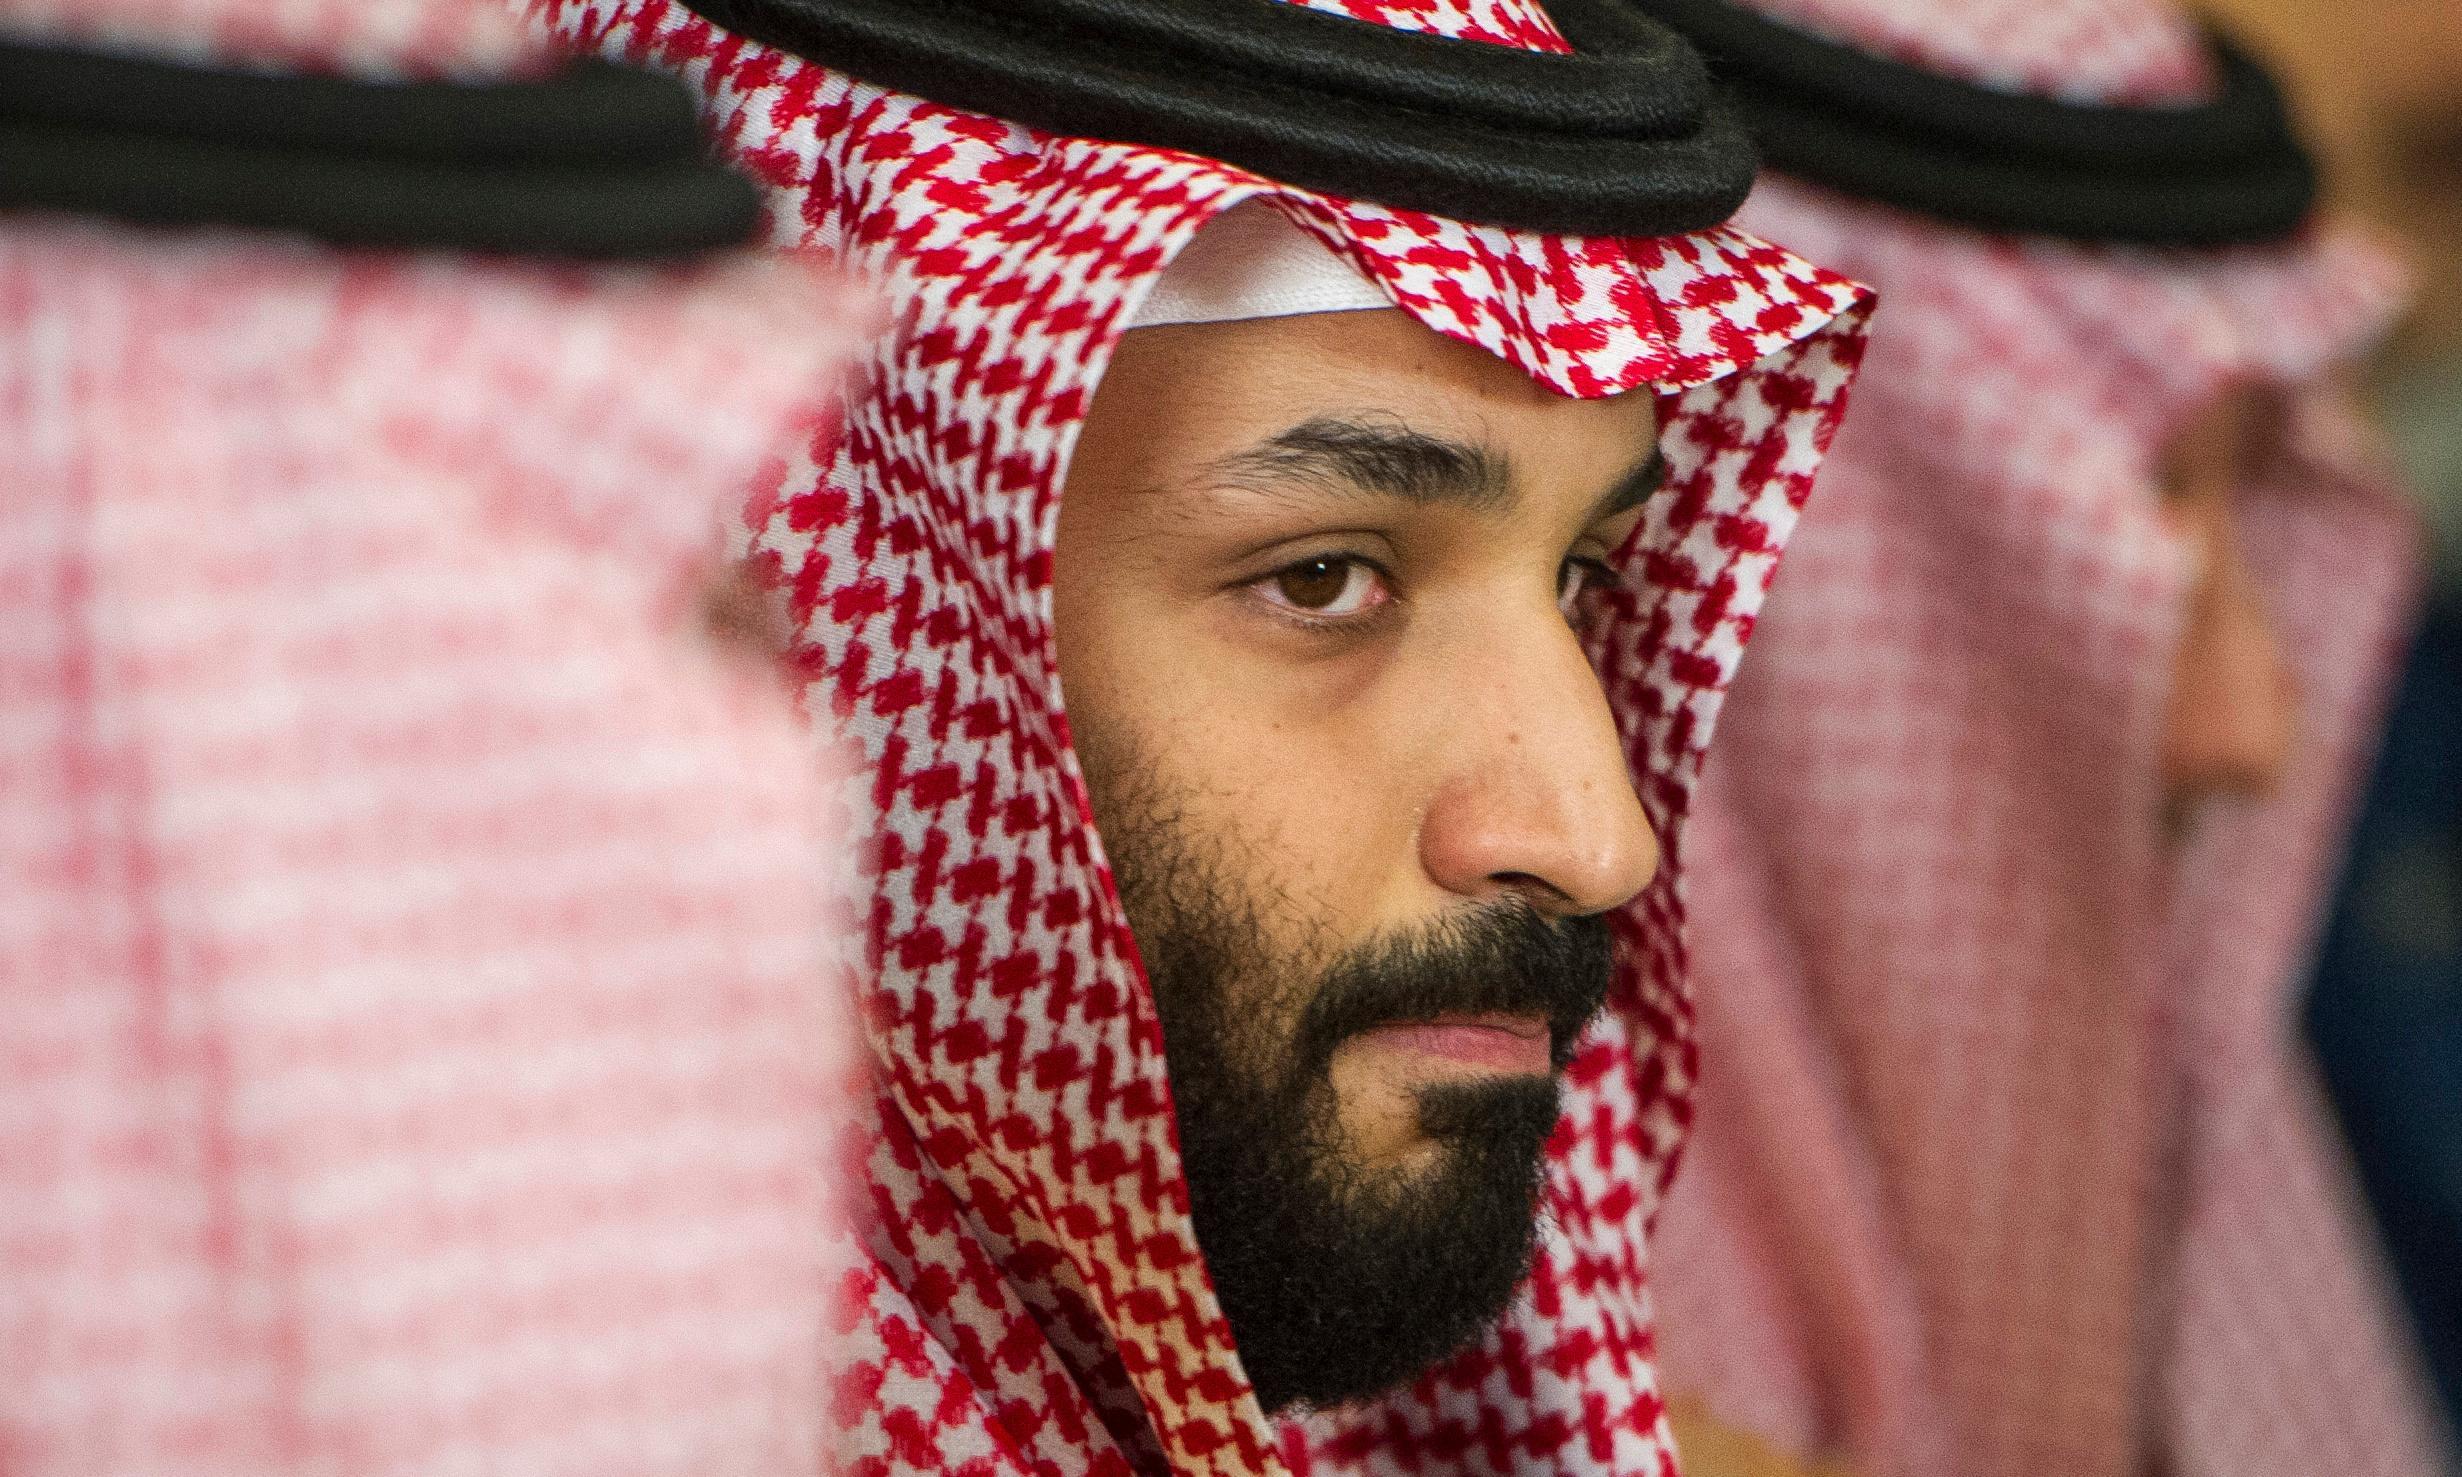 Jamal Khashoggi: Saudis blame 'rogues' as pressure on crown prince grows